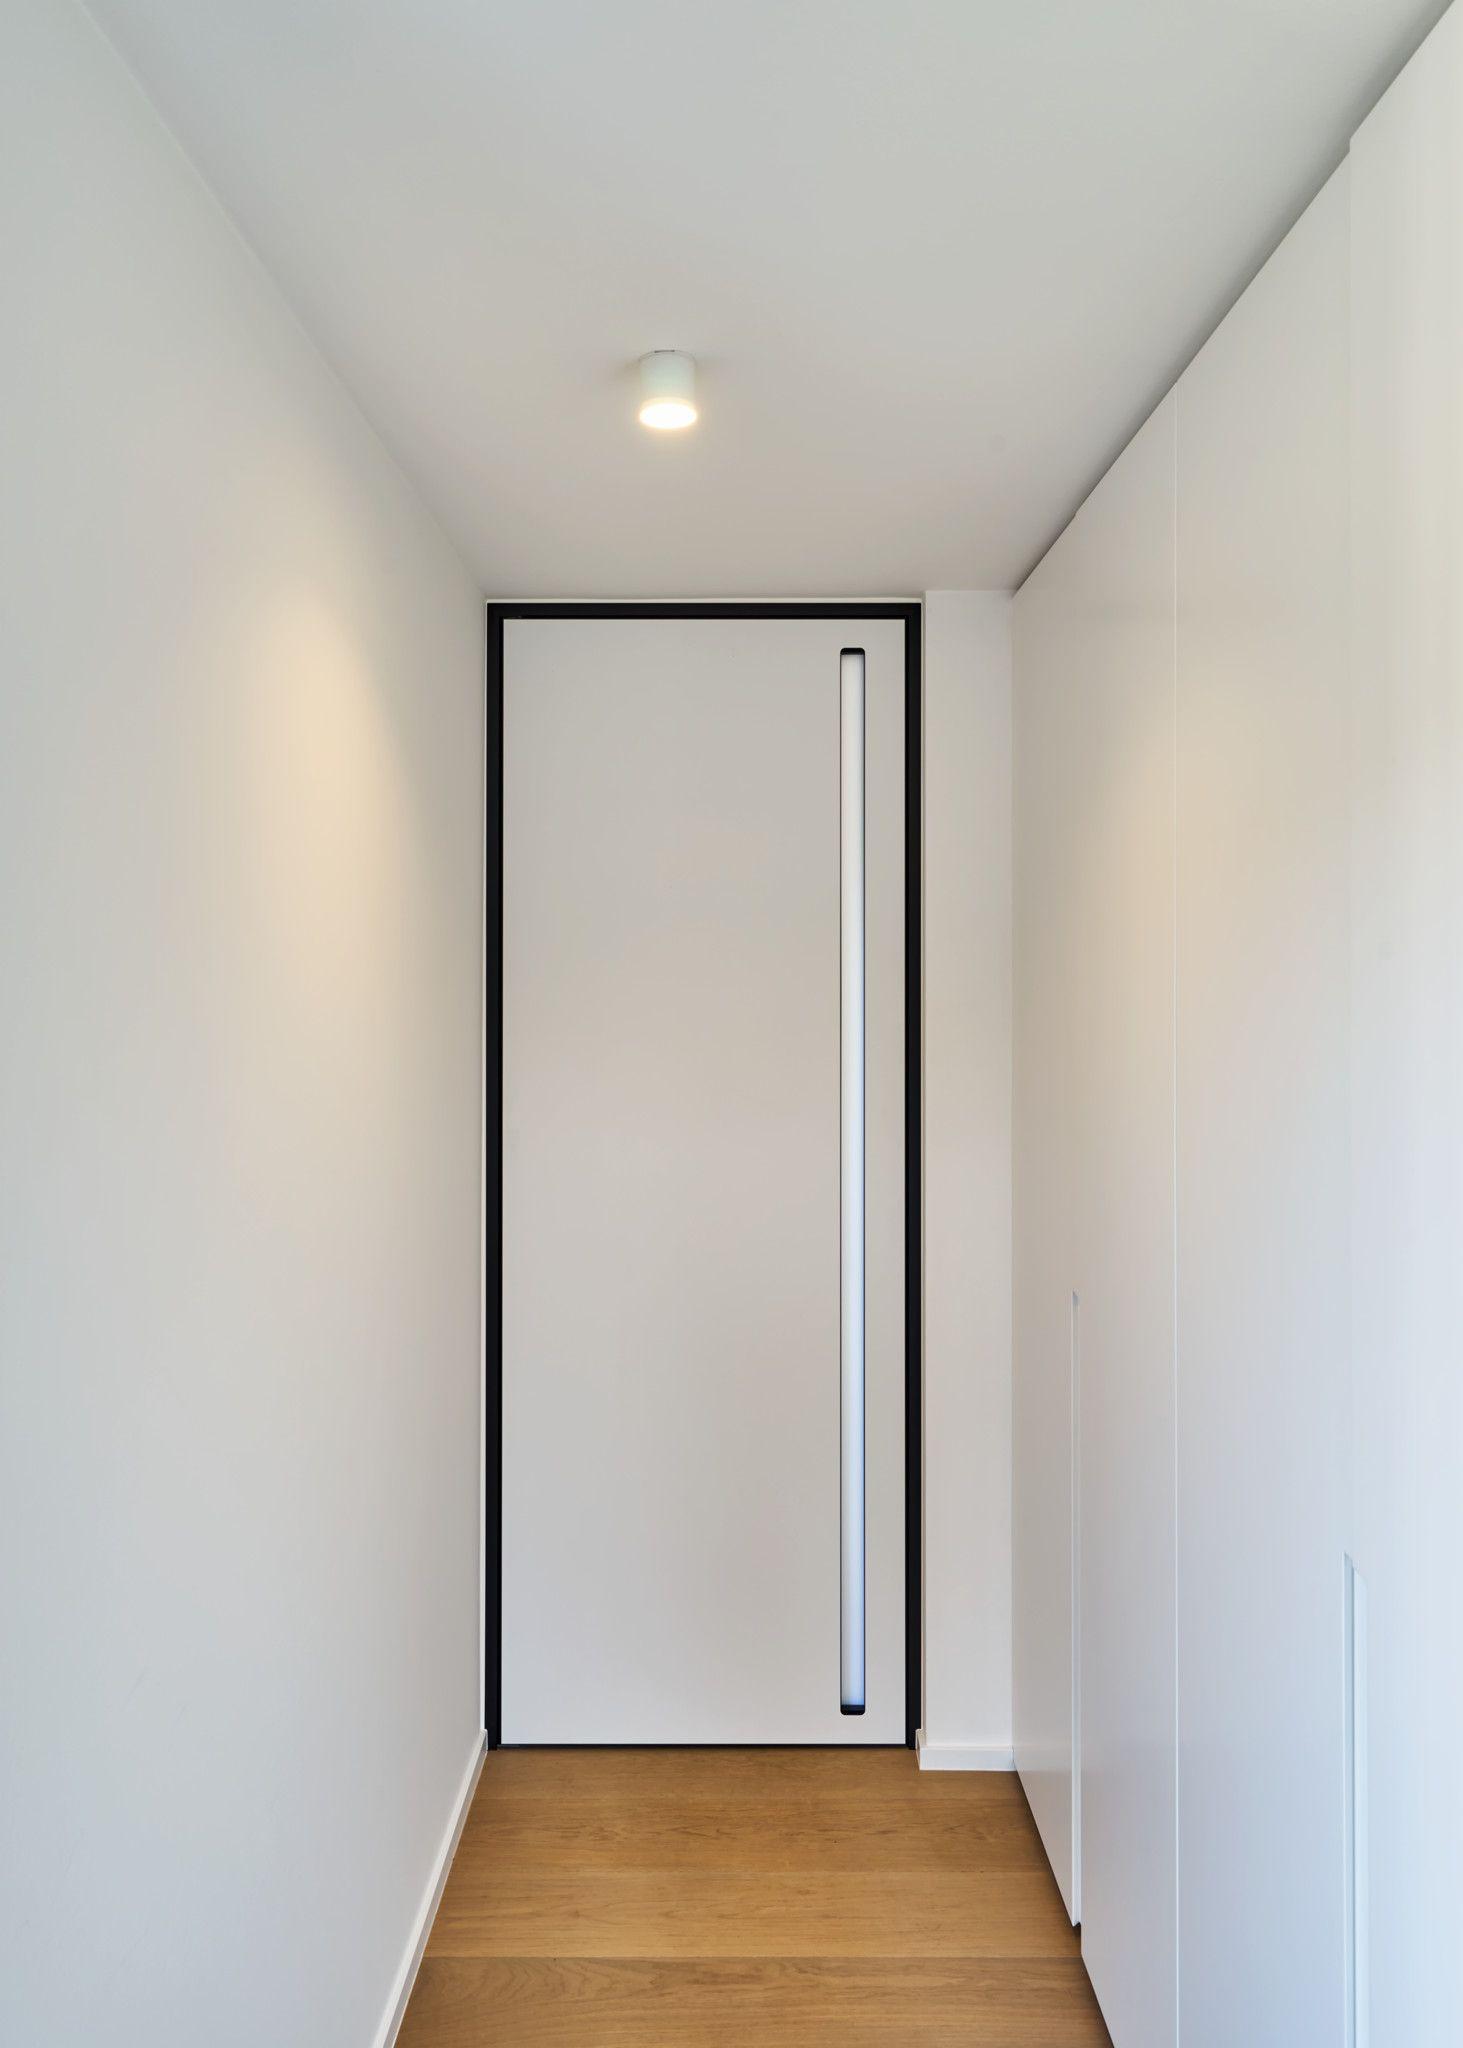 Black interior doors, Van and Black interiors on Pinterest